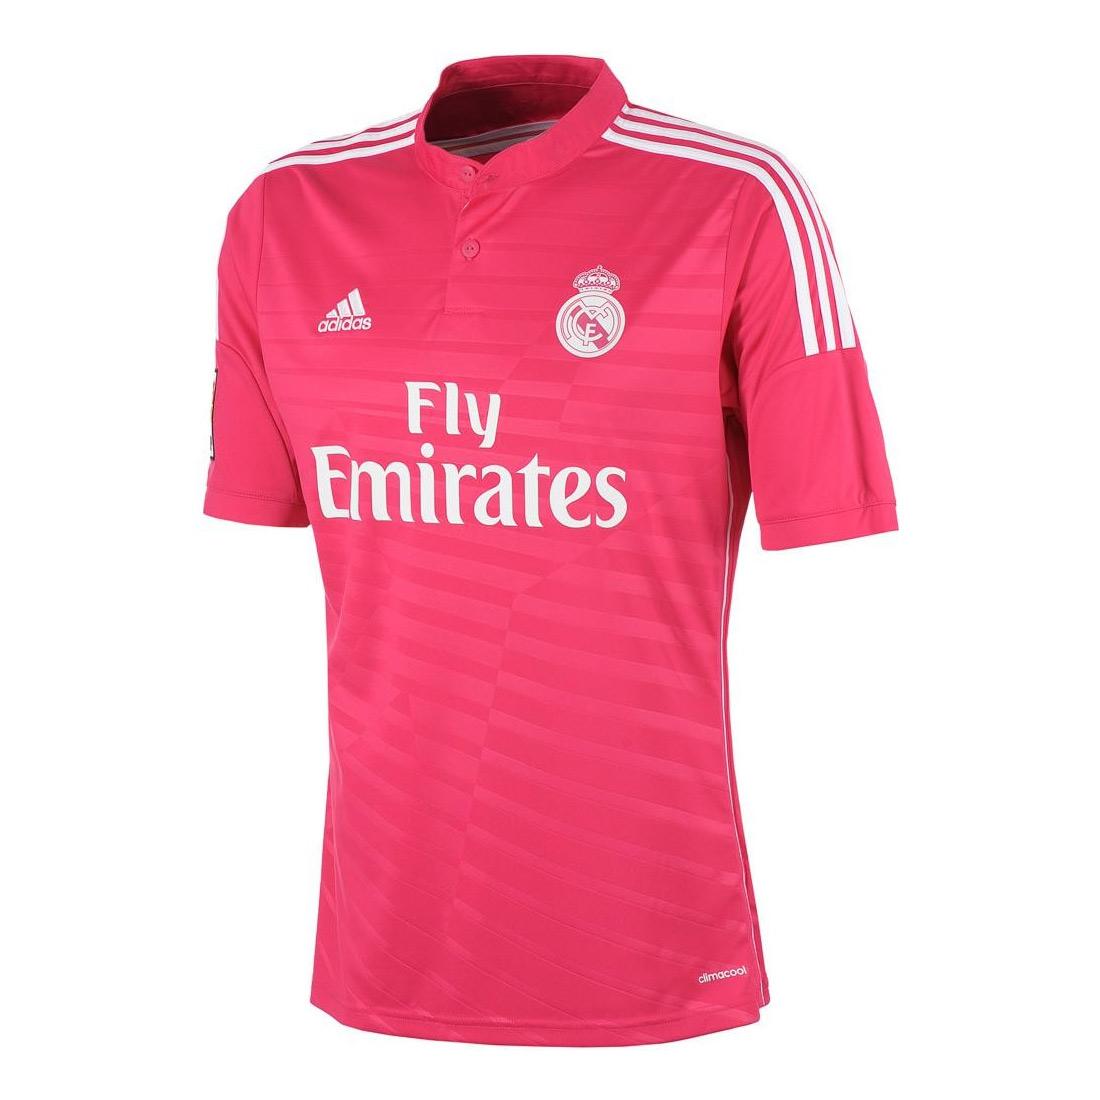 aabc3def556 Adidas Real Madrid Kids Leotard Pink Jersey Nip Primera Division 128 ...